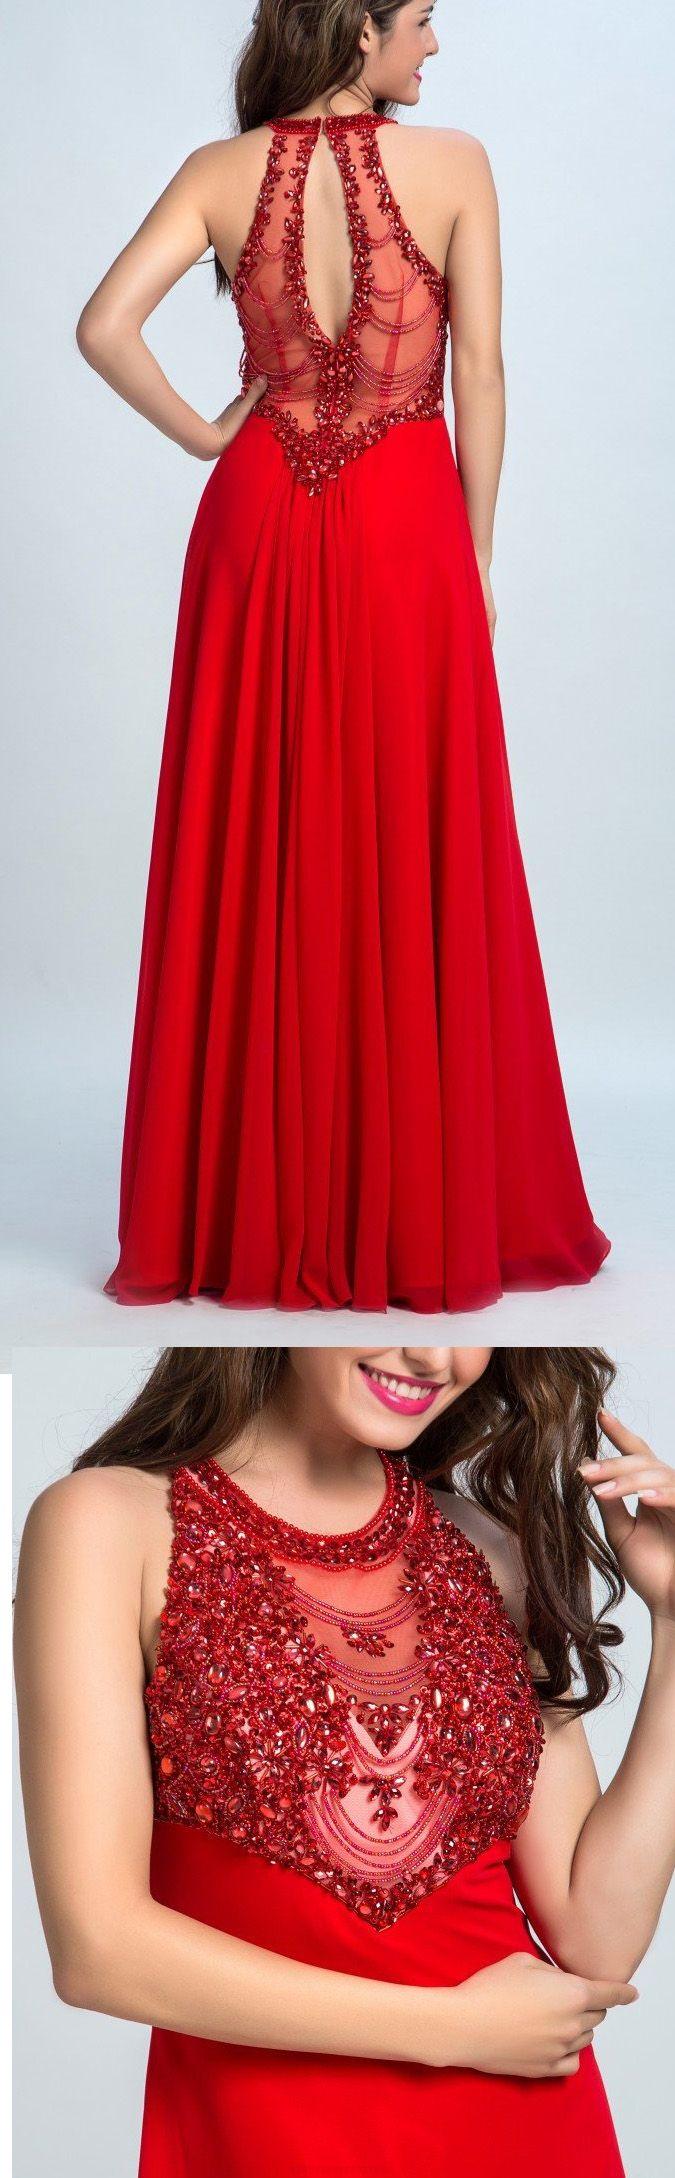 Sleeveless evening dresses red sleeveless prom dresses long